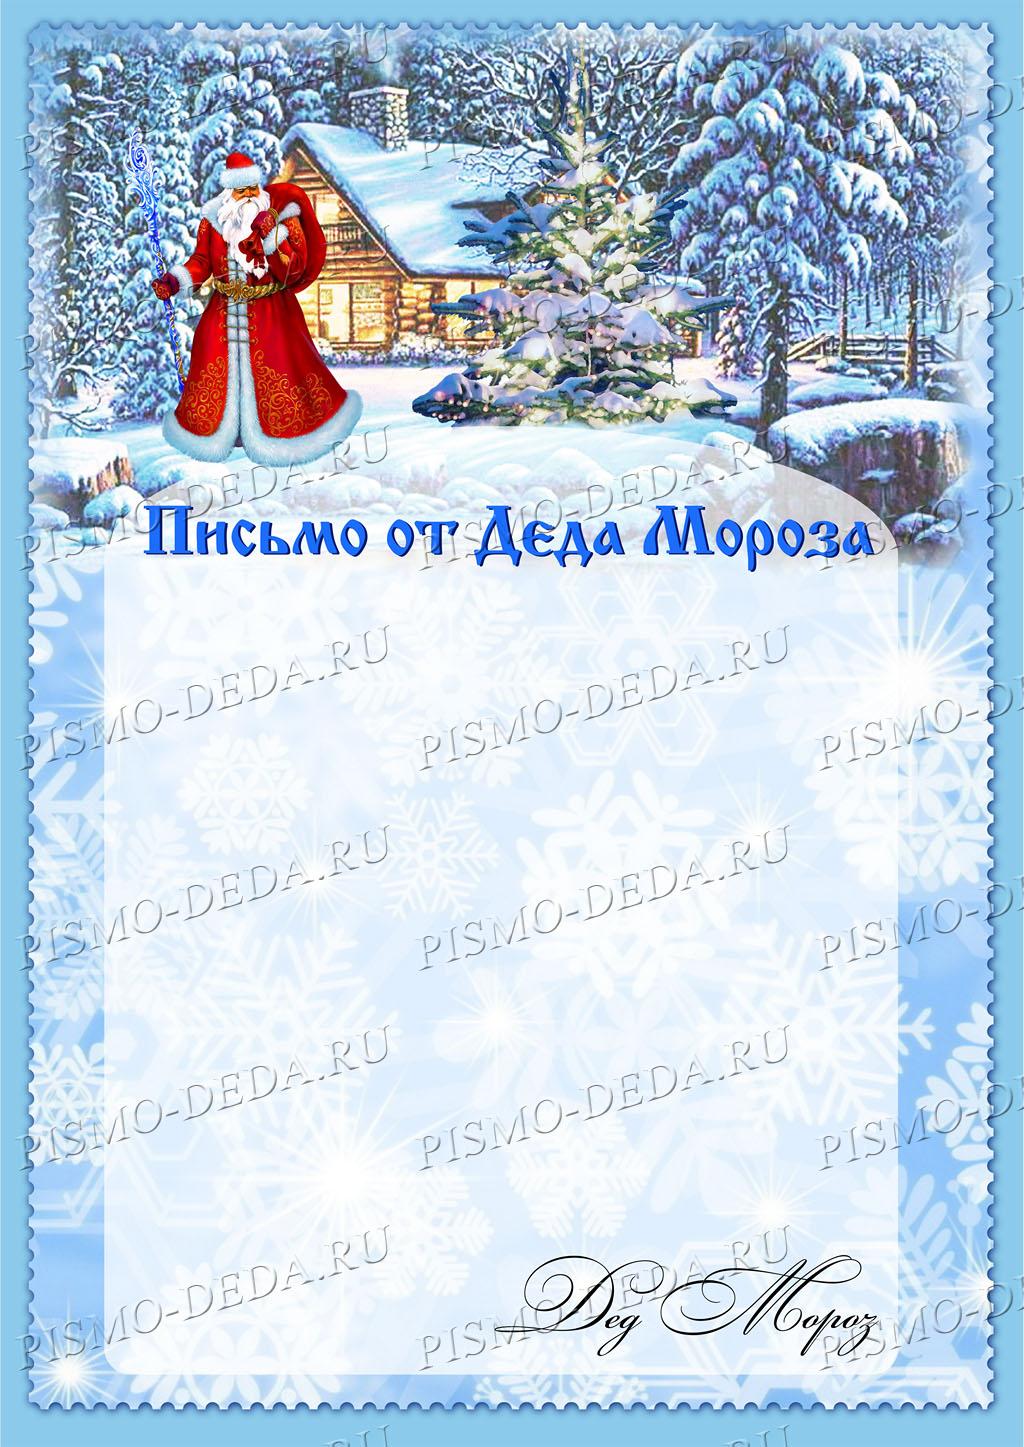 бланк письма от деда мороза 2014